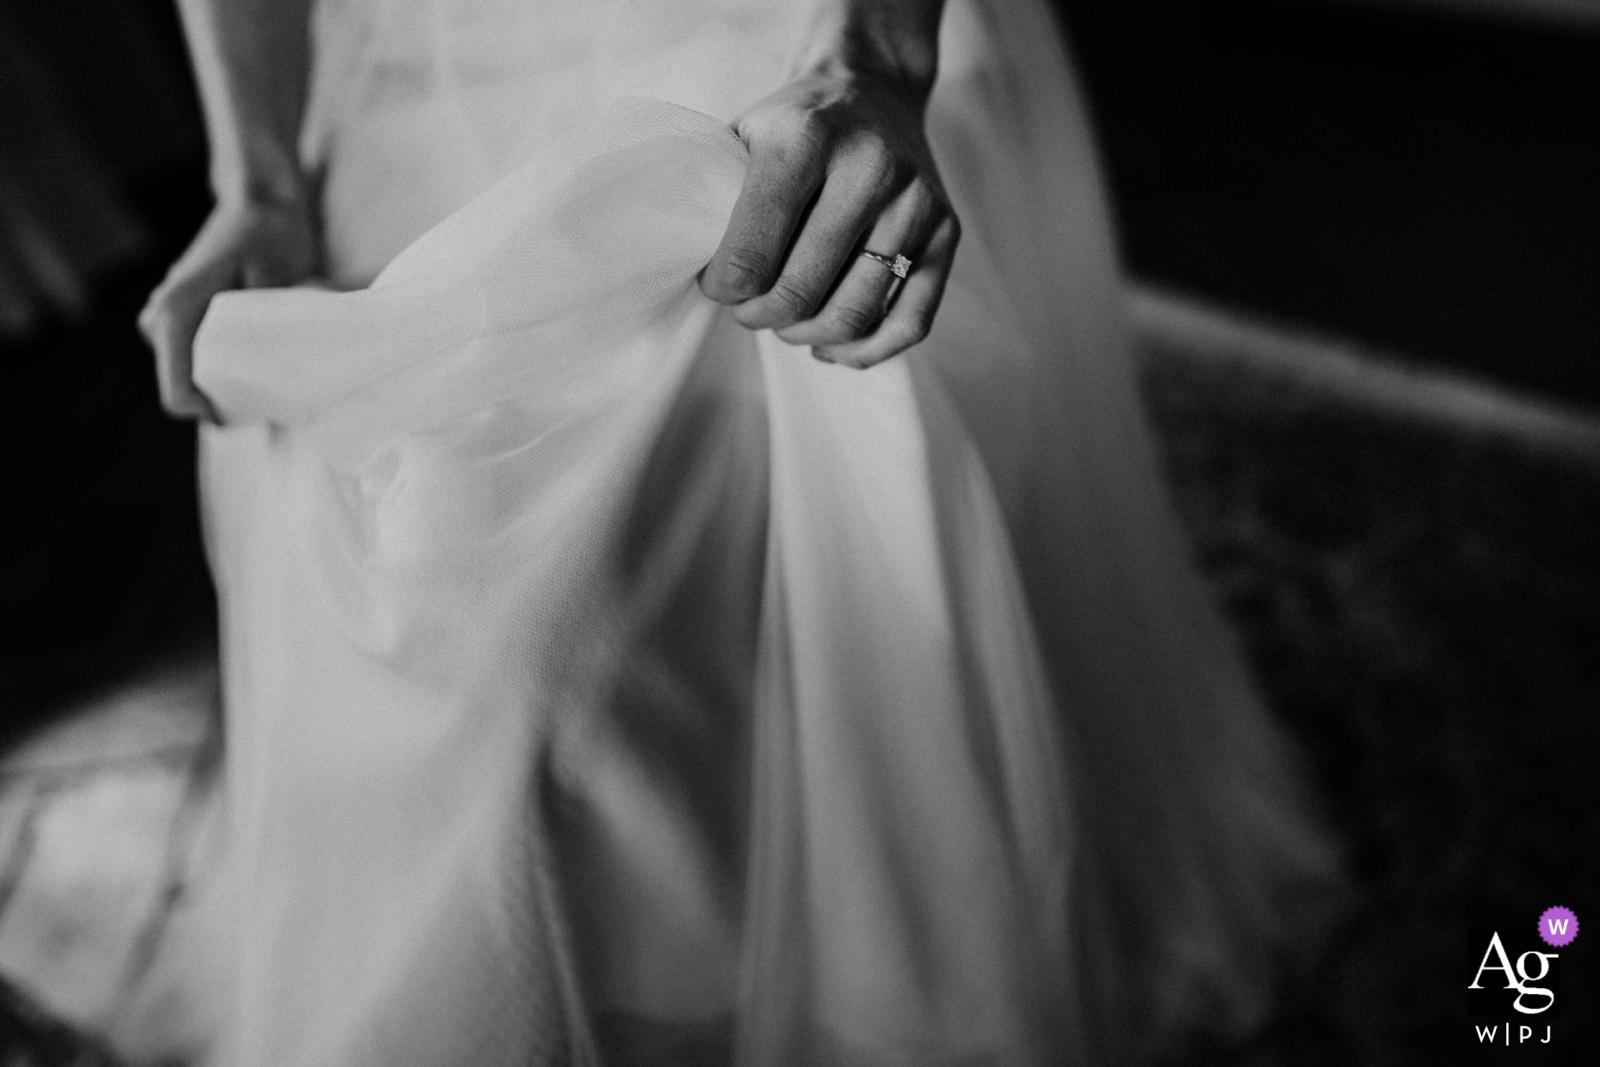 Agriturismo Pian Di Filetto wedding photographer | Black and white detail the bride Gettin' Ready